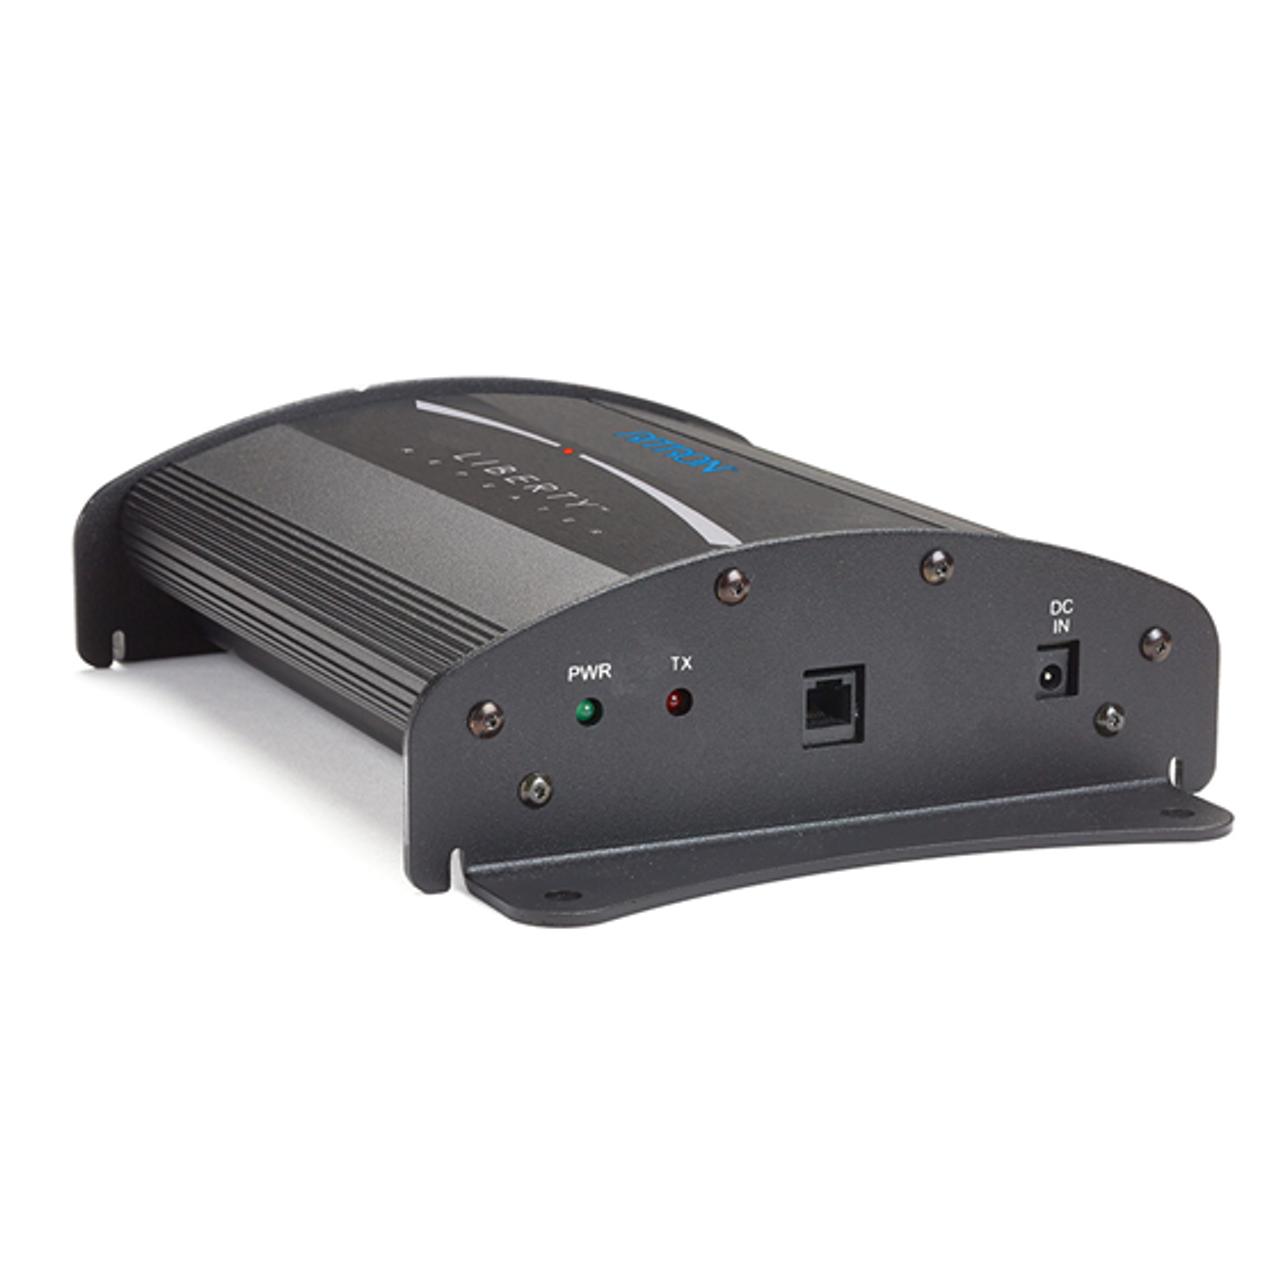 Ritron Liberty 5 Watt UHF Two Way Radio Repeaters extend two way radio range by up to 50%